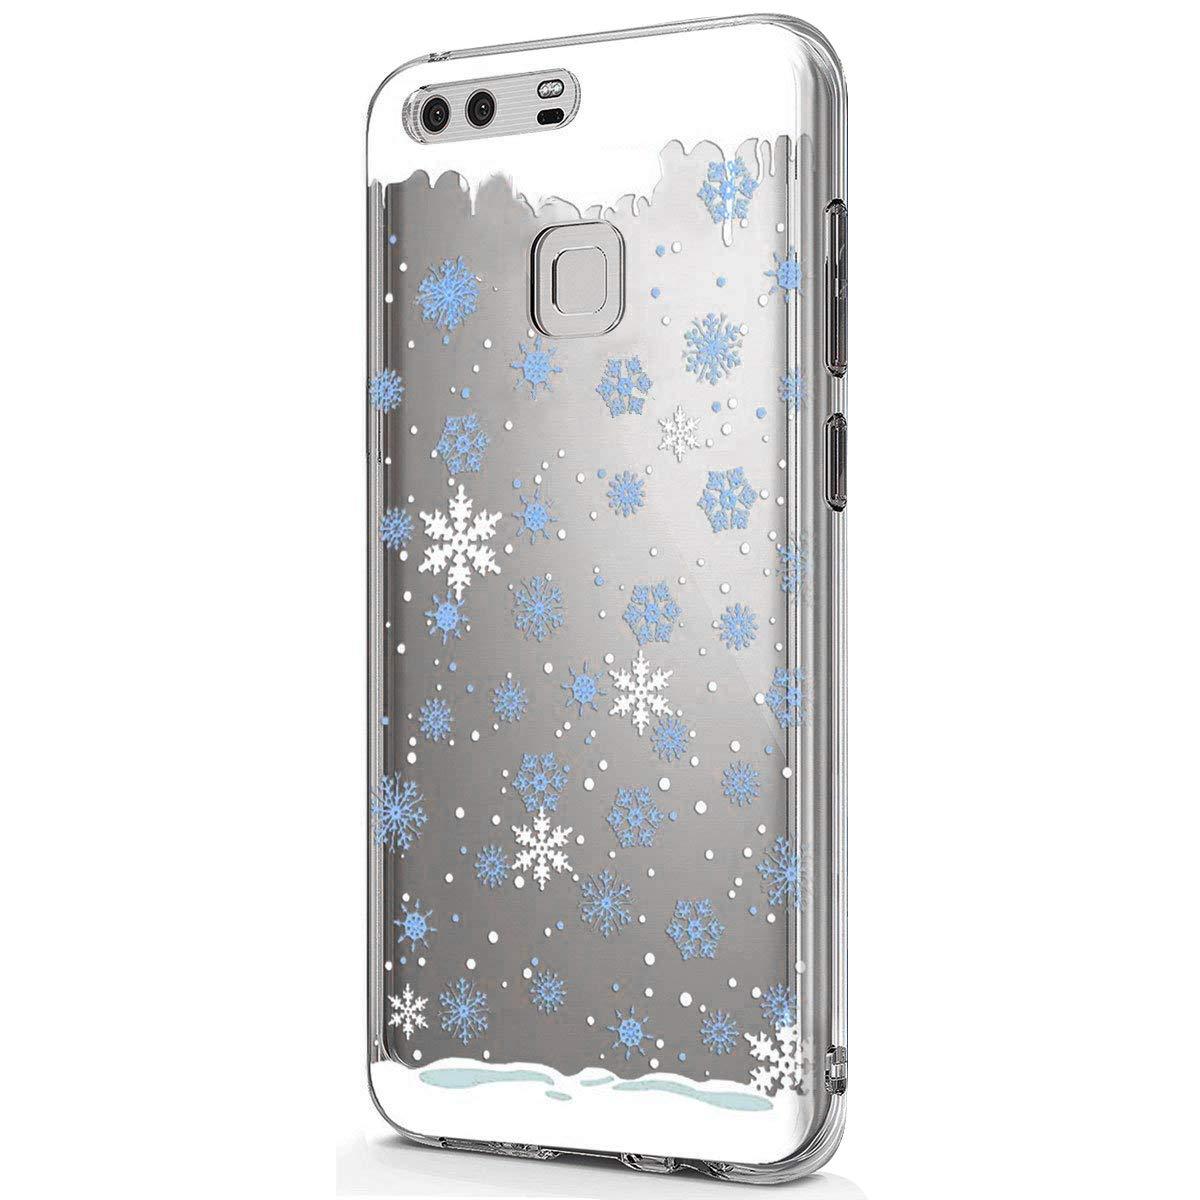 Clair Coque Huawei Mate 9, Coque Huawei Mate 9 Transparente, Huawei Mate 9 Etui en Silicone Extra Slim Lé ger Gel TPU Souple Etui Cré atif Noë l Christmas Flocon de Neige é lan Motif Okssud DYY2018002194#08